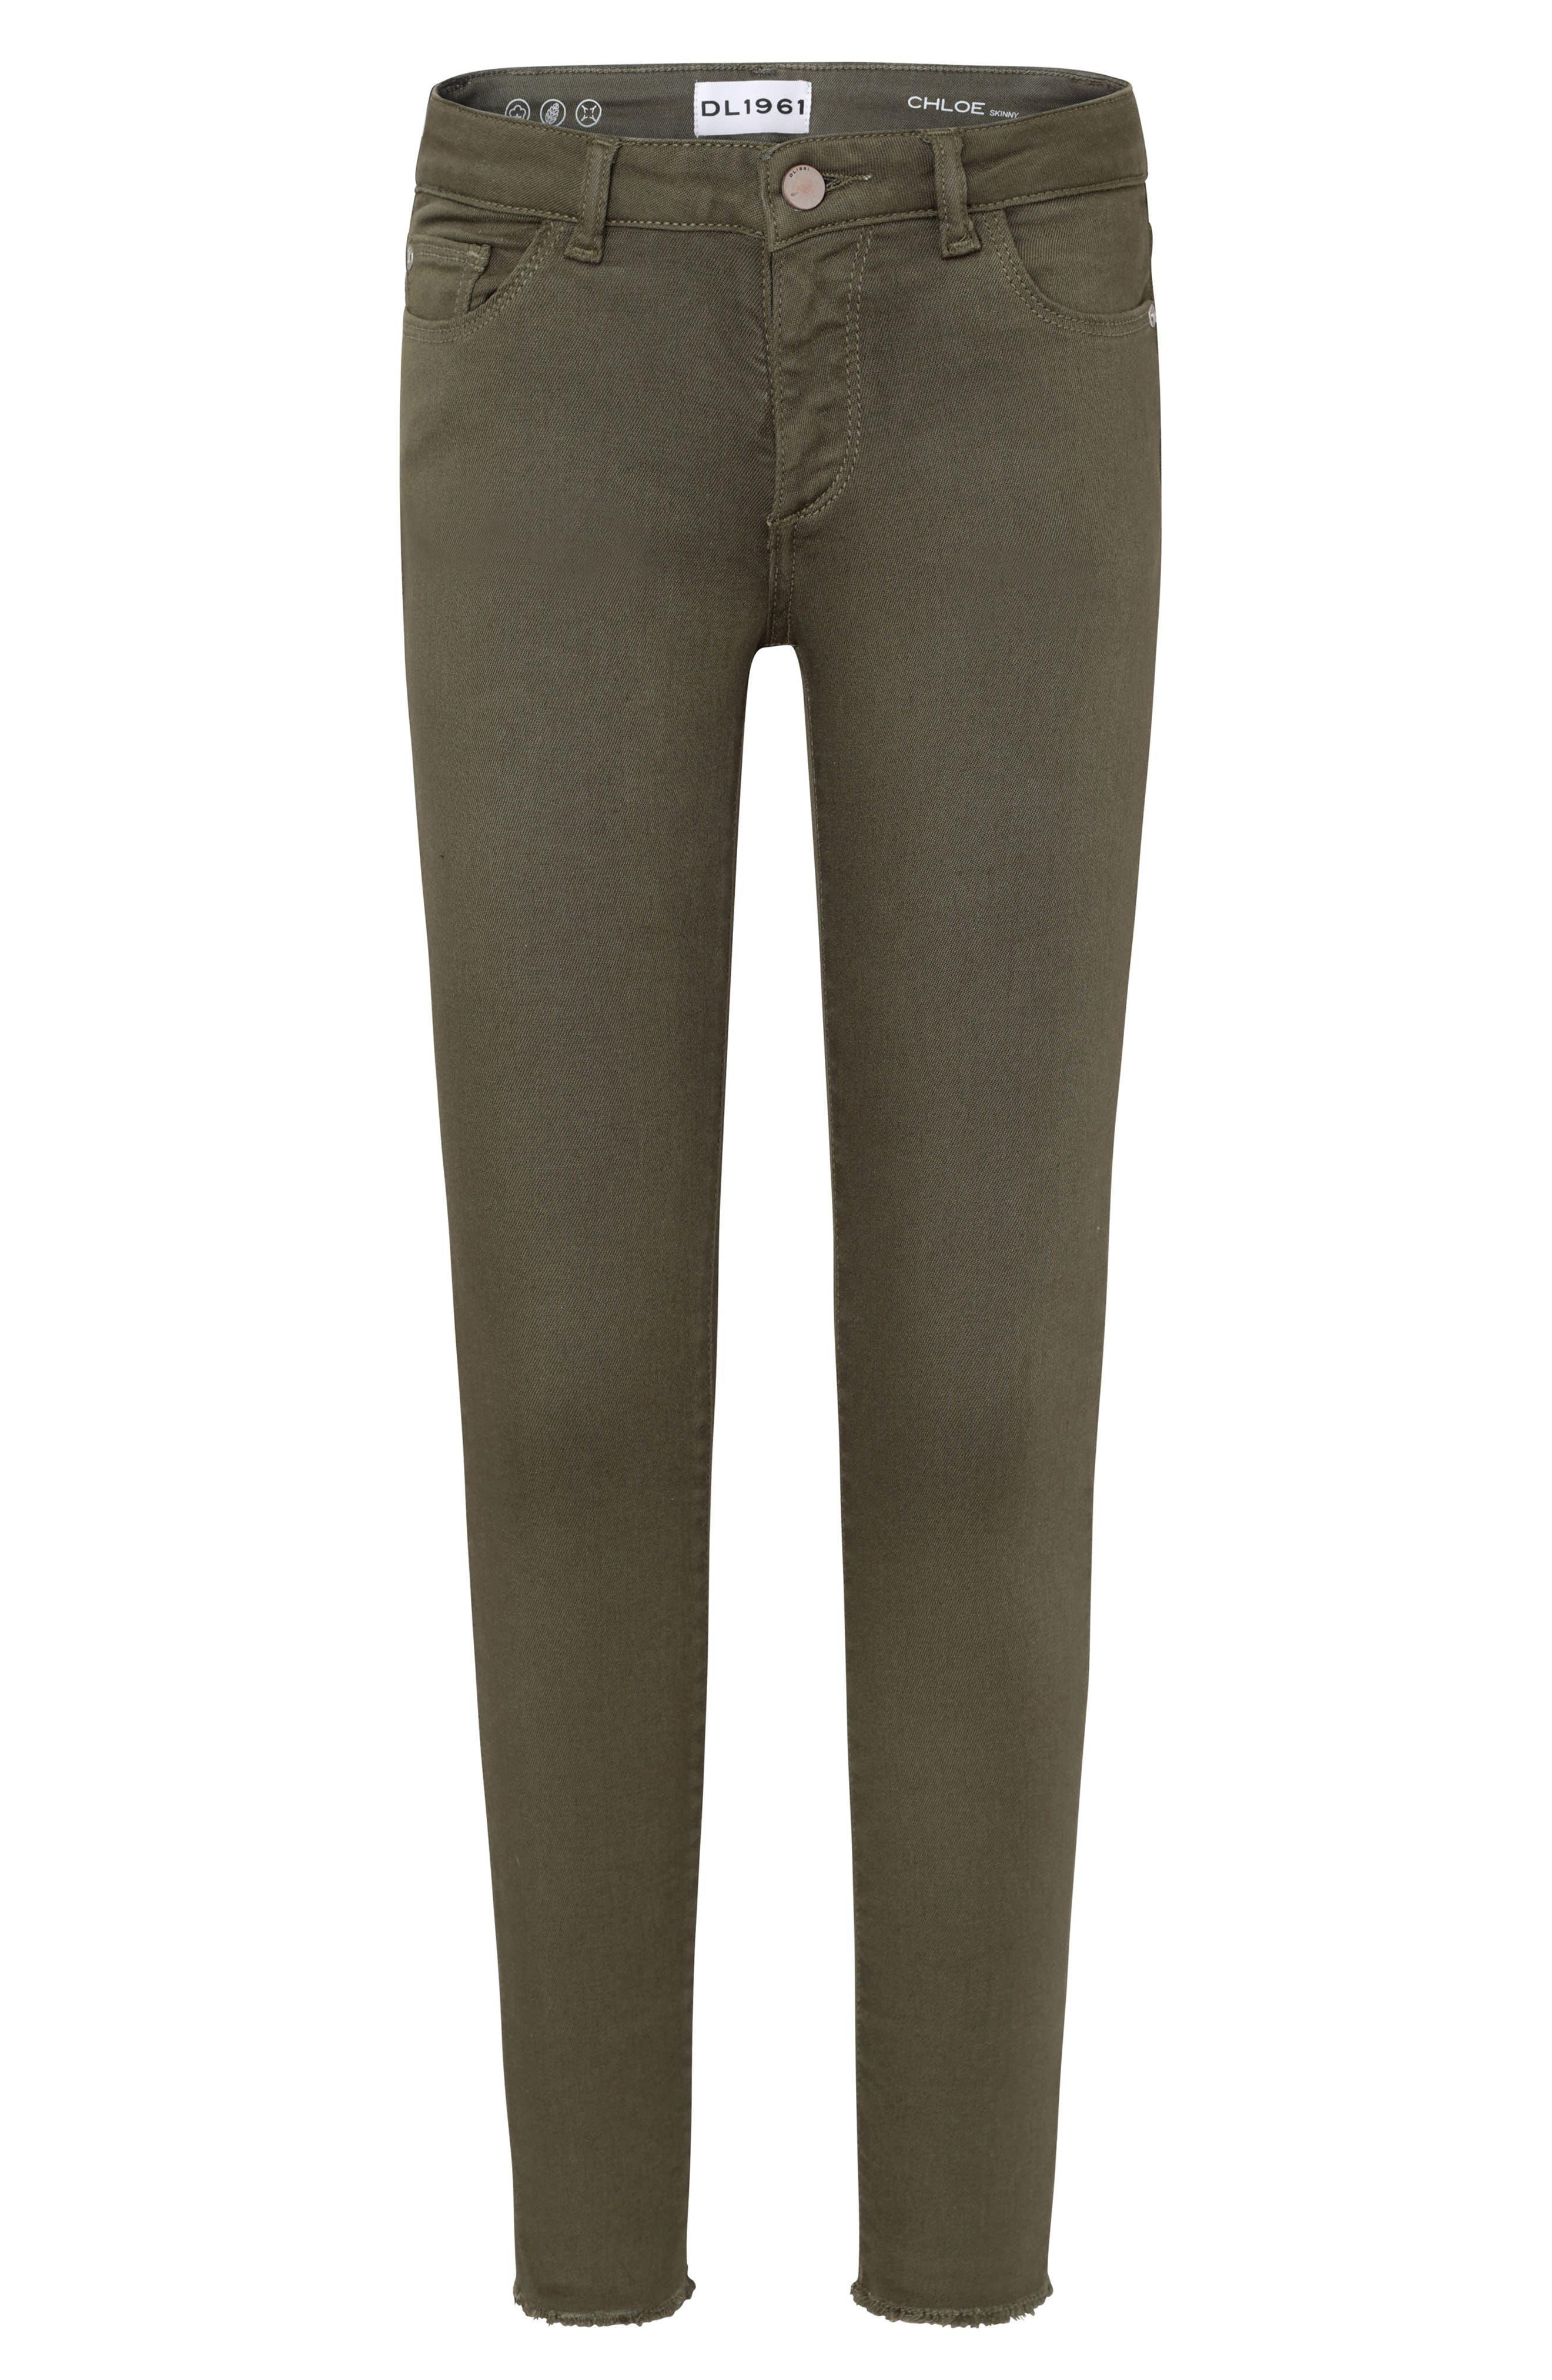 DL1961 Raw Hem Skinny Jeans, Main, color, CAMO GREEN